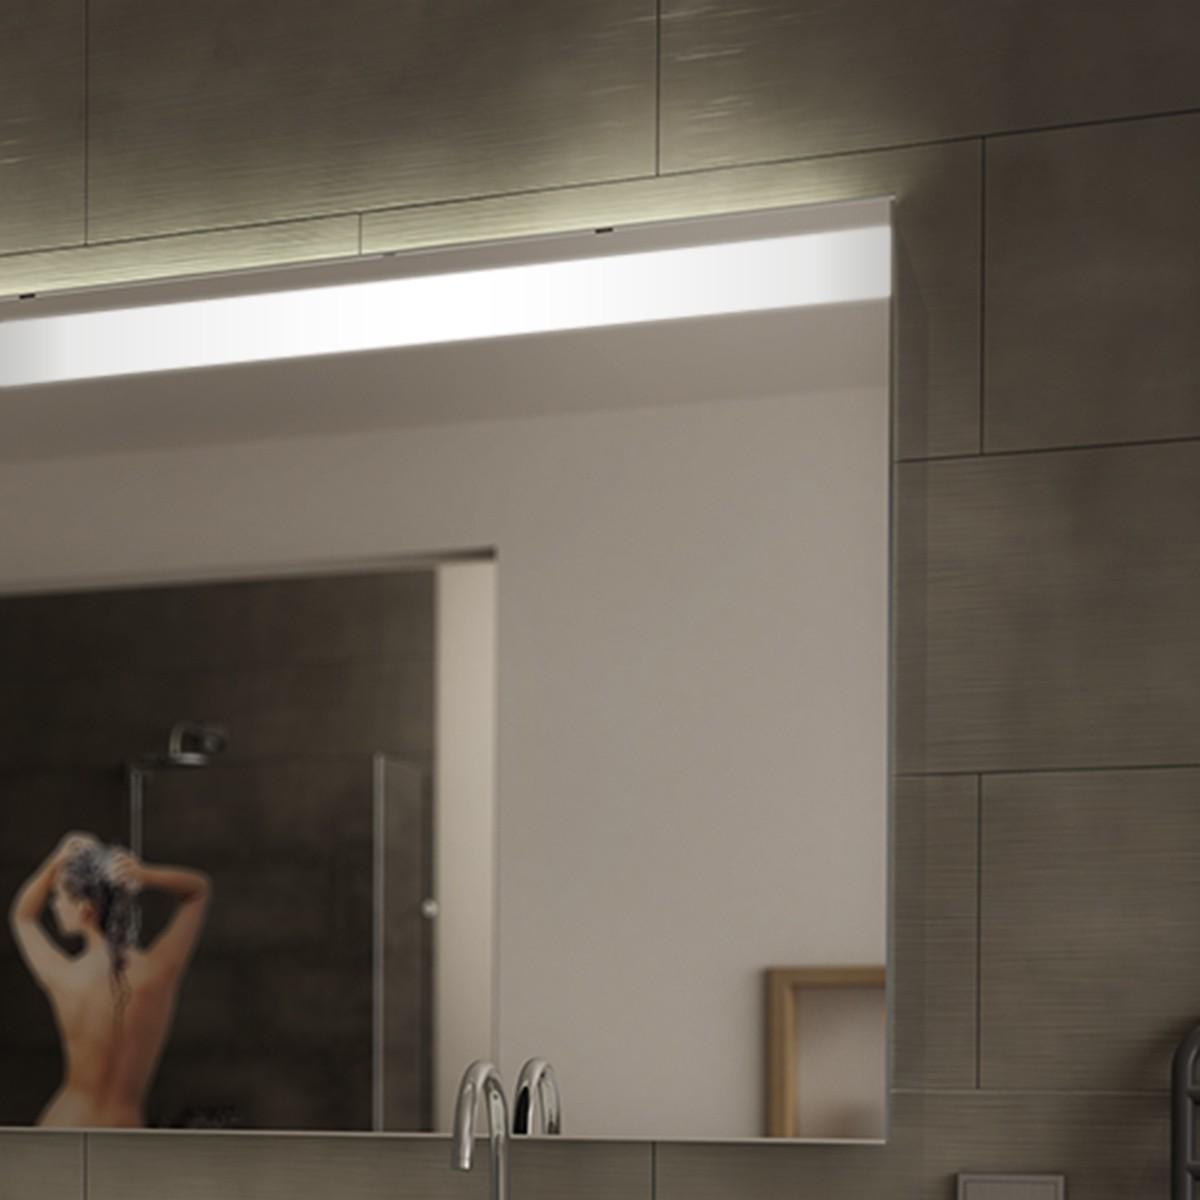 wandspiegel mit beleuchtung zesah 300871281. Black Bedroom Furniture Sets. Home Design Ideas